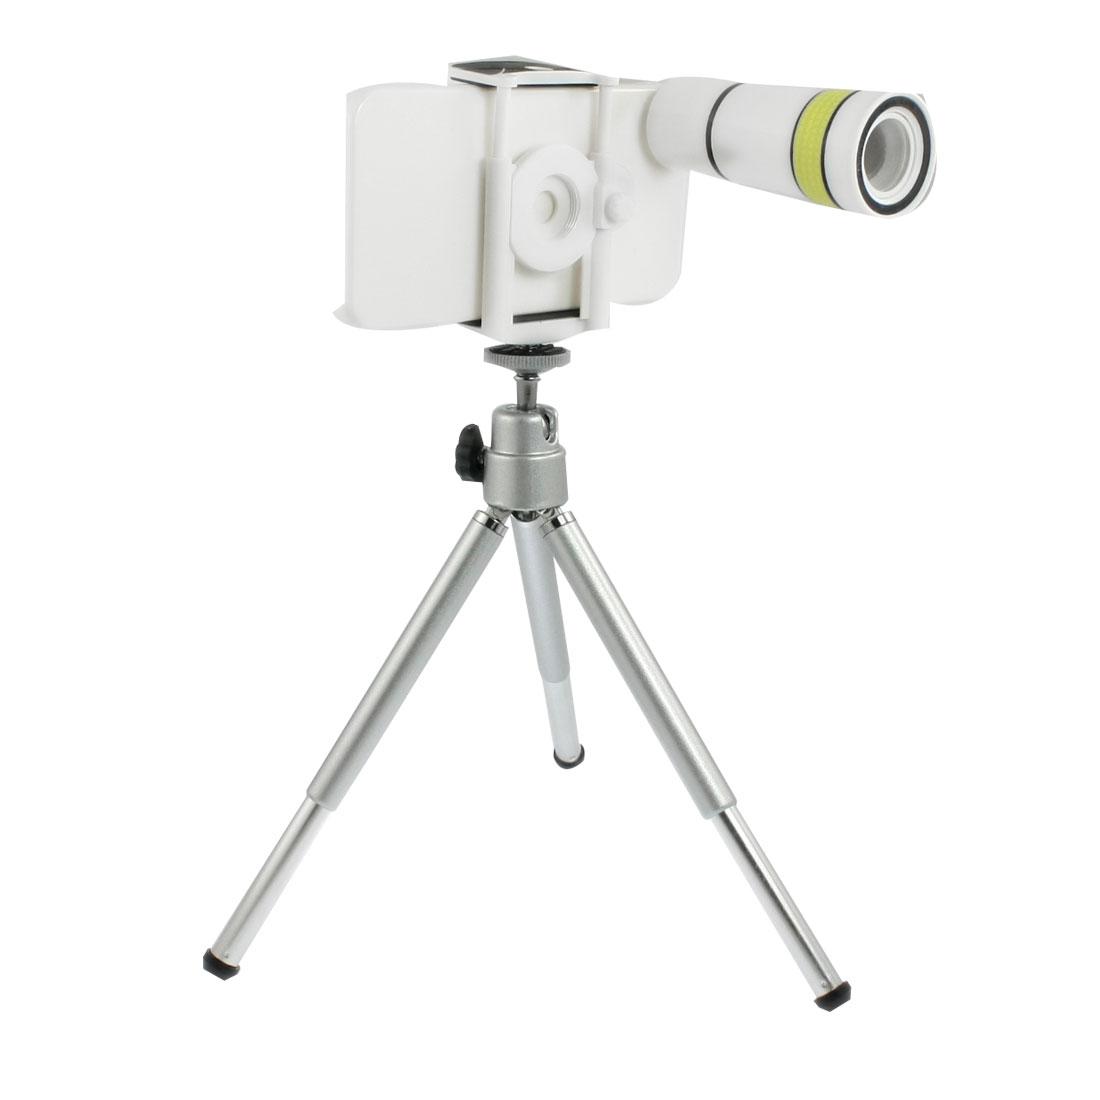 Mini Tripod Holder 10X Zoom Telescope Camera Lens w White Back Case for Cell Phone